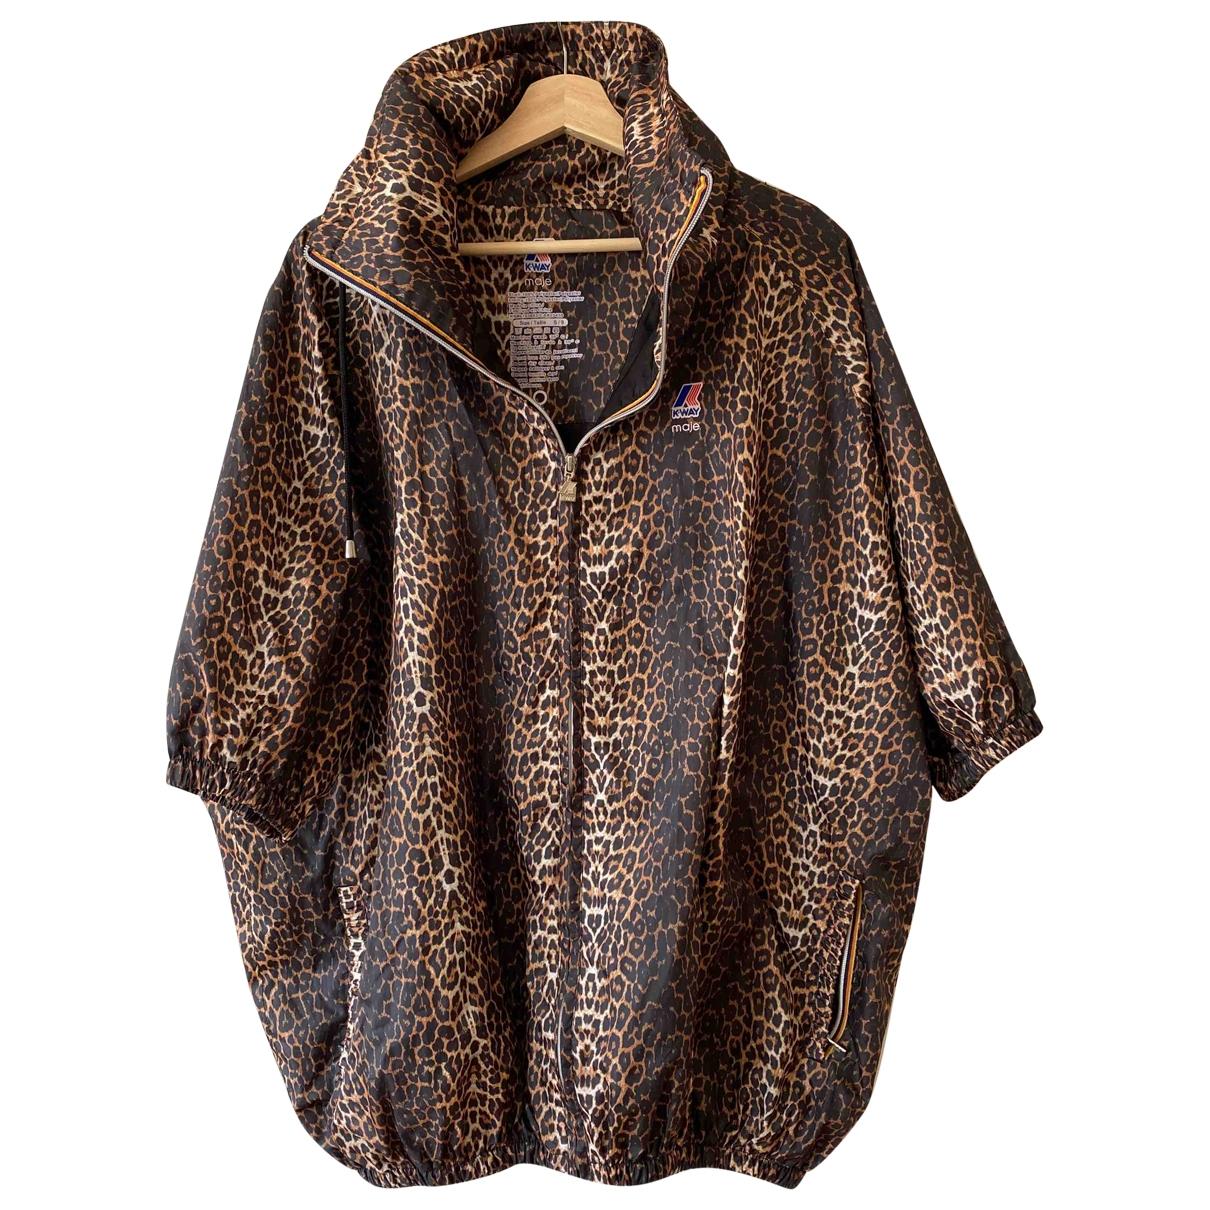 Maje \N Multicolour jacket for Women S International